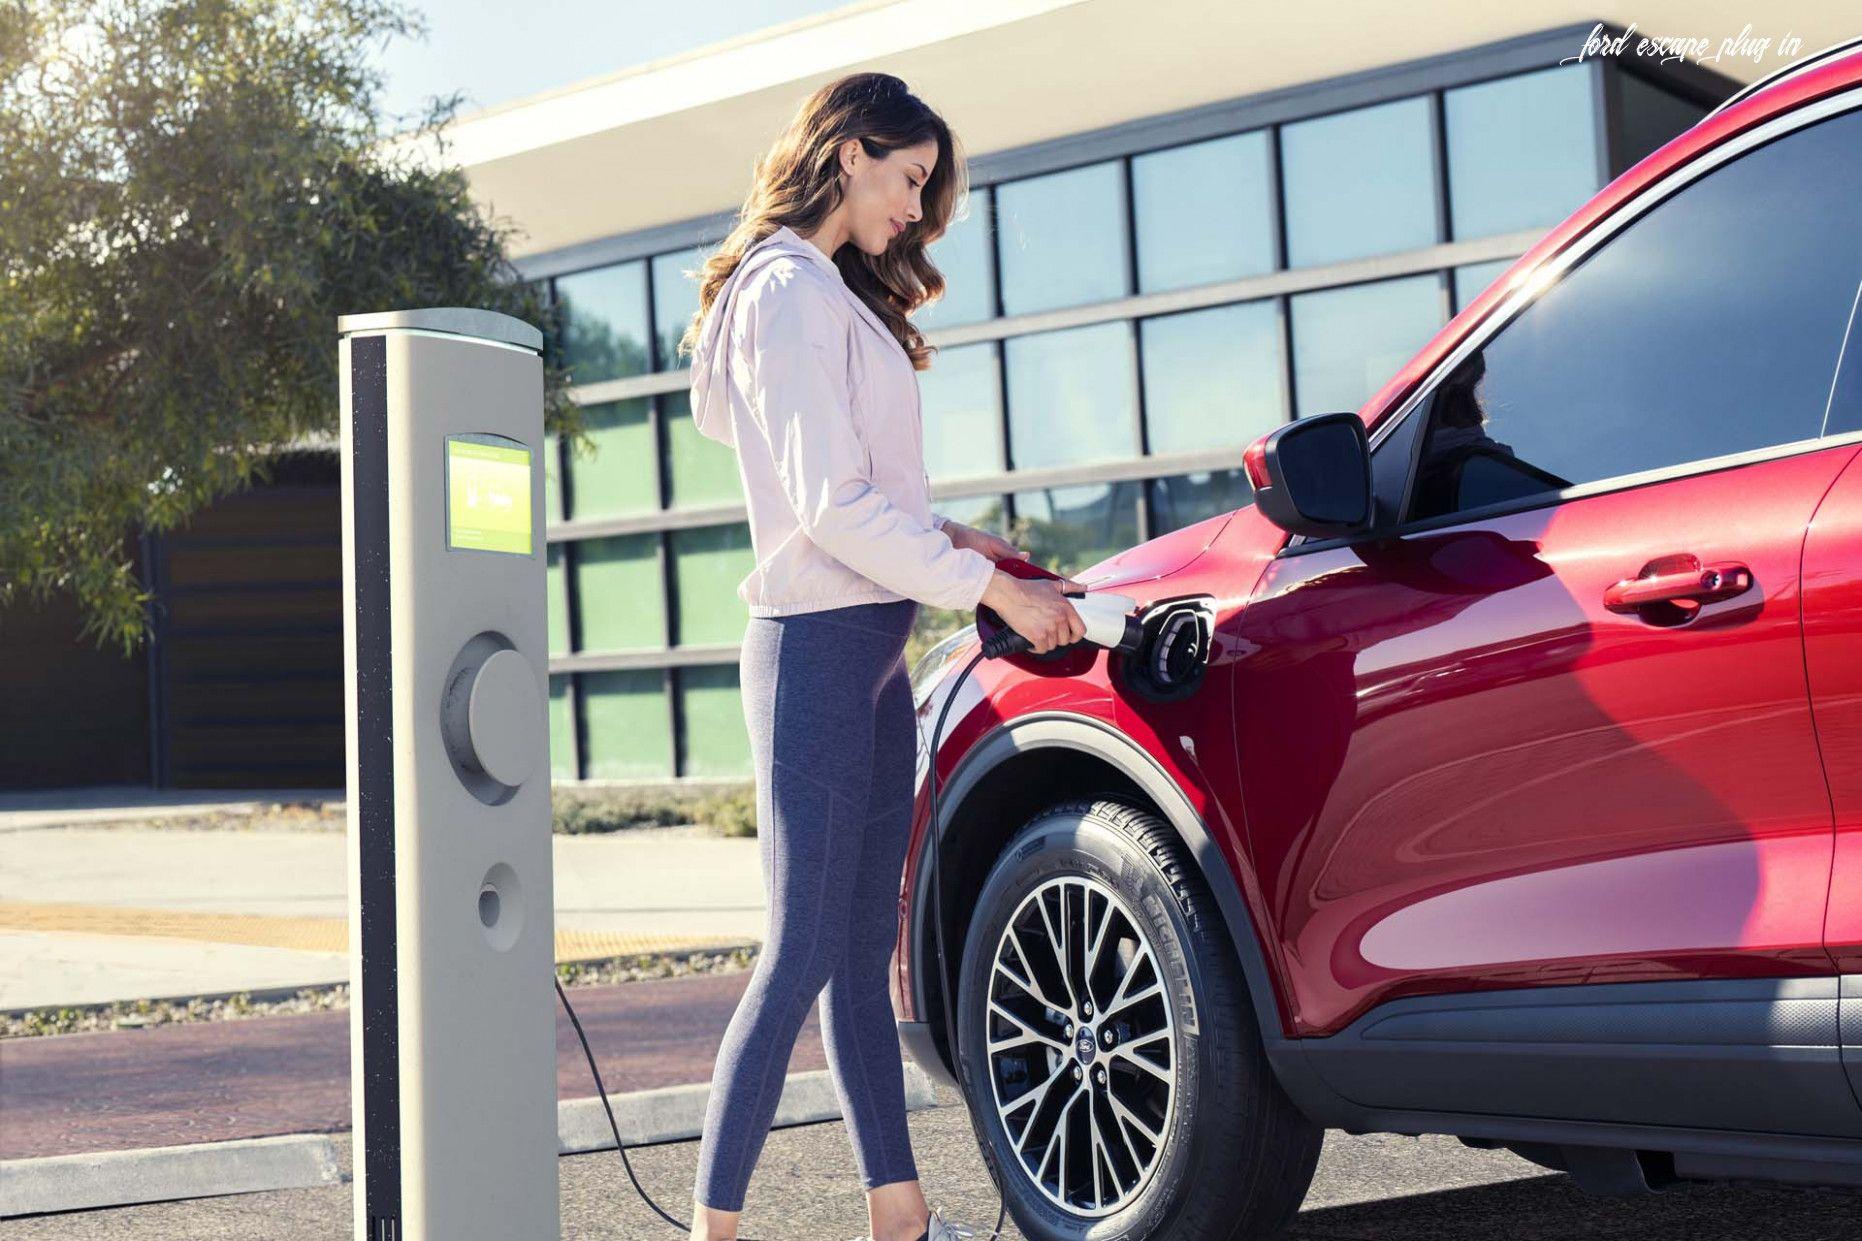 Ford Escape Plug In Release Date In 2020 Ford Escape Ford